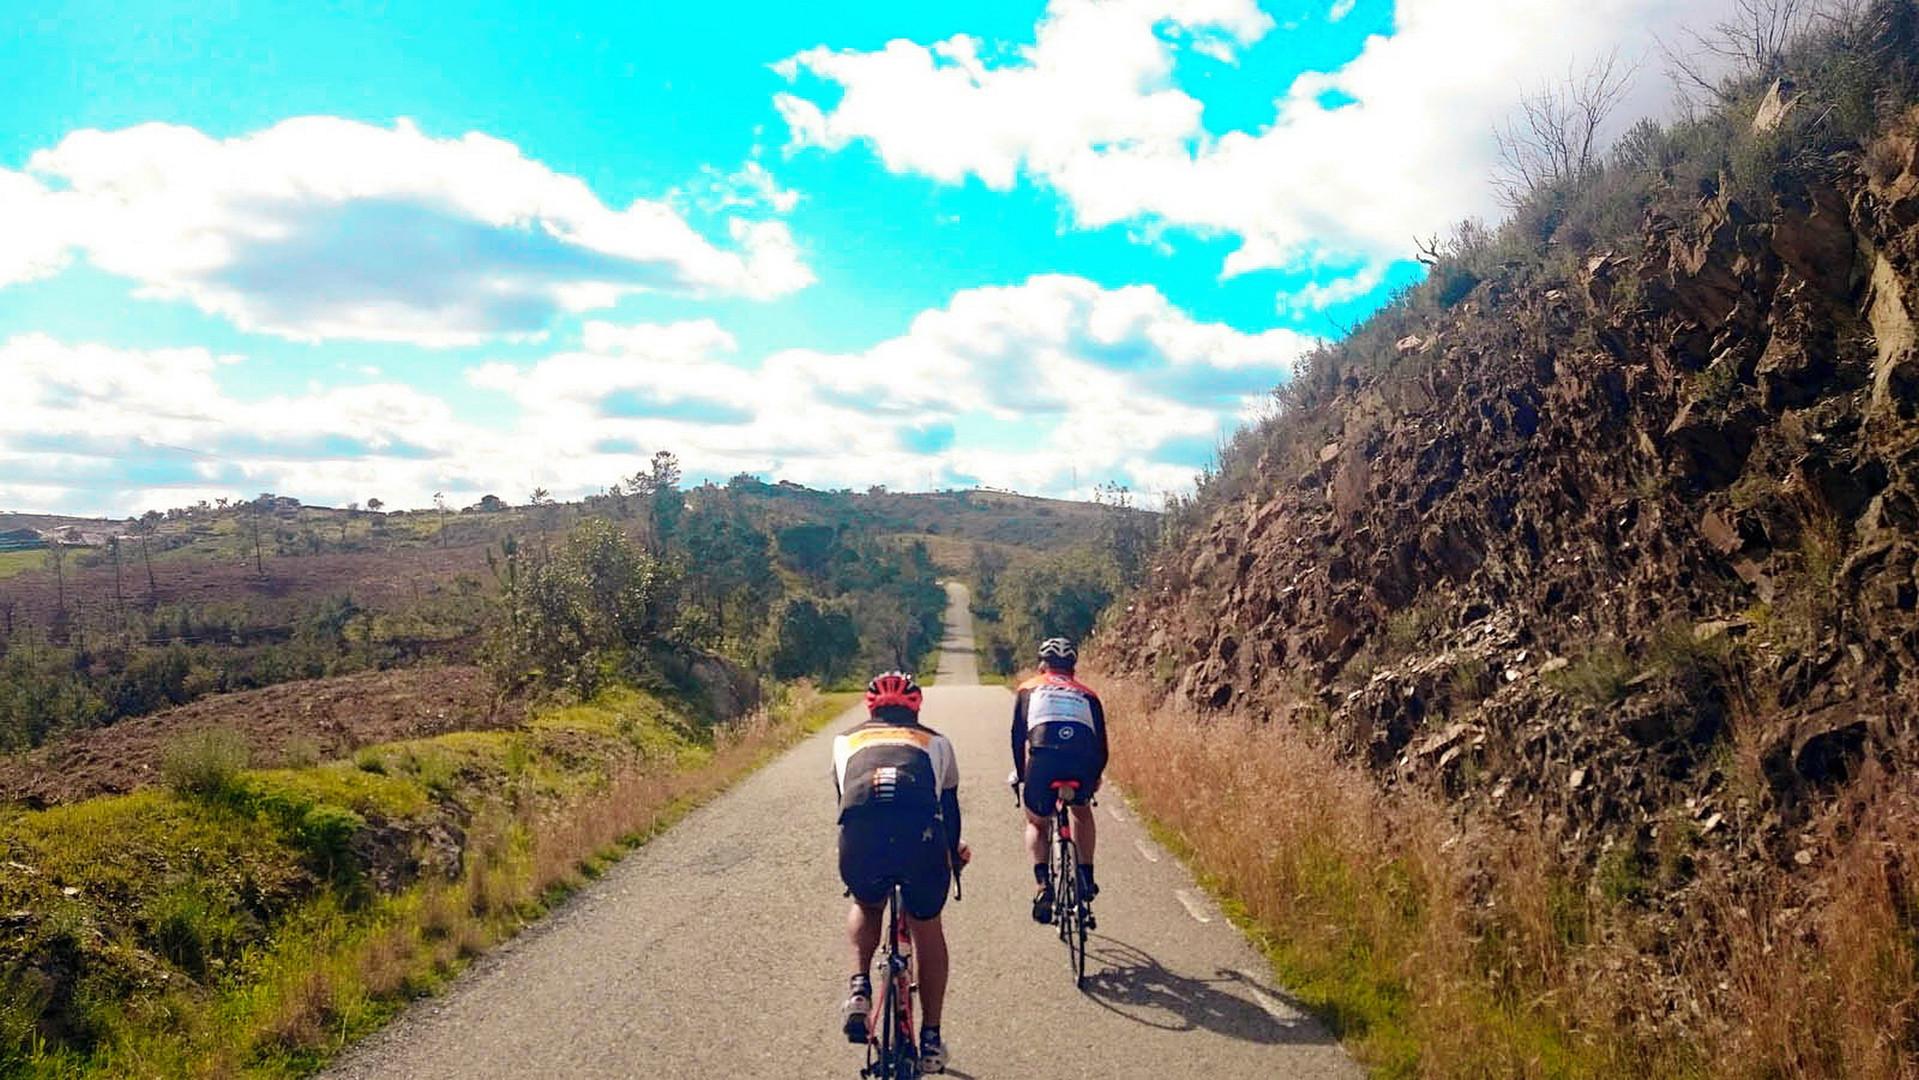 bike-tours-algarve-alg-ale_11.jpg